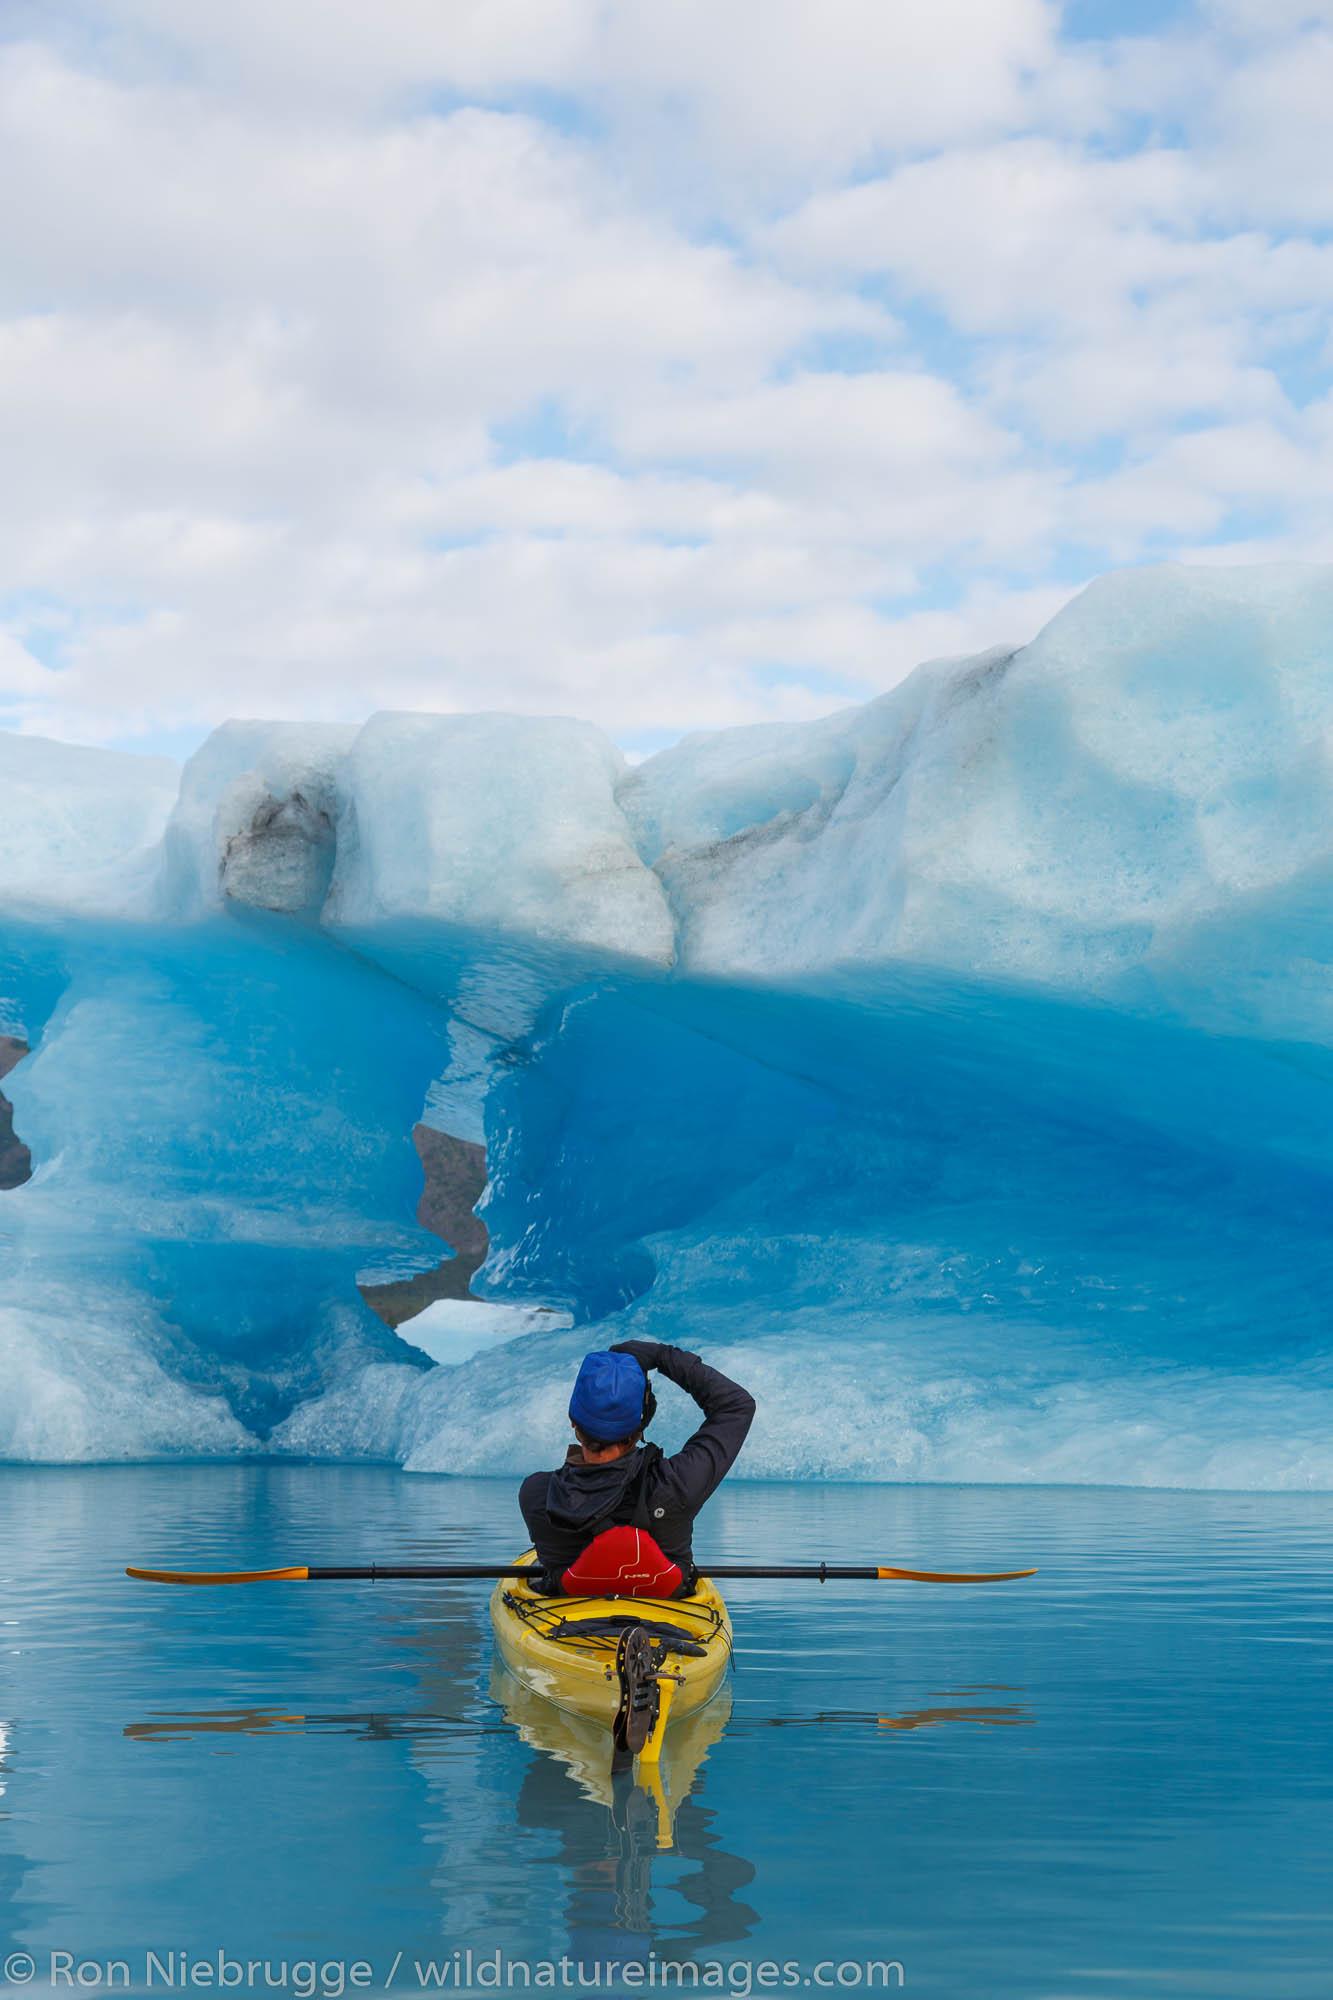 Kayaking in Bear Glacier Lagoon, Kenai Fjords National Park, near Seward, Alaska.  (model released)